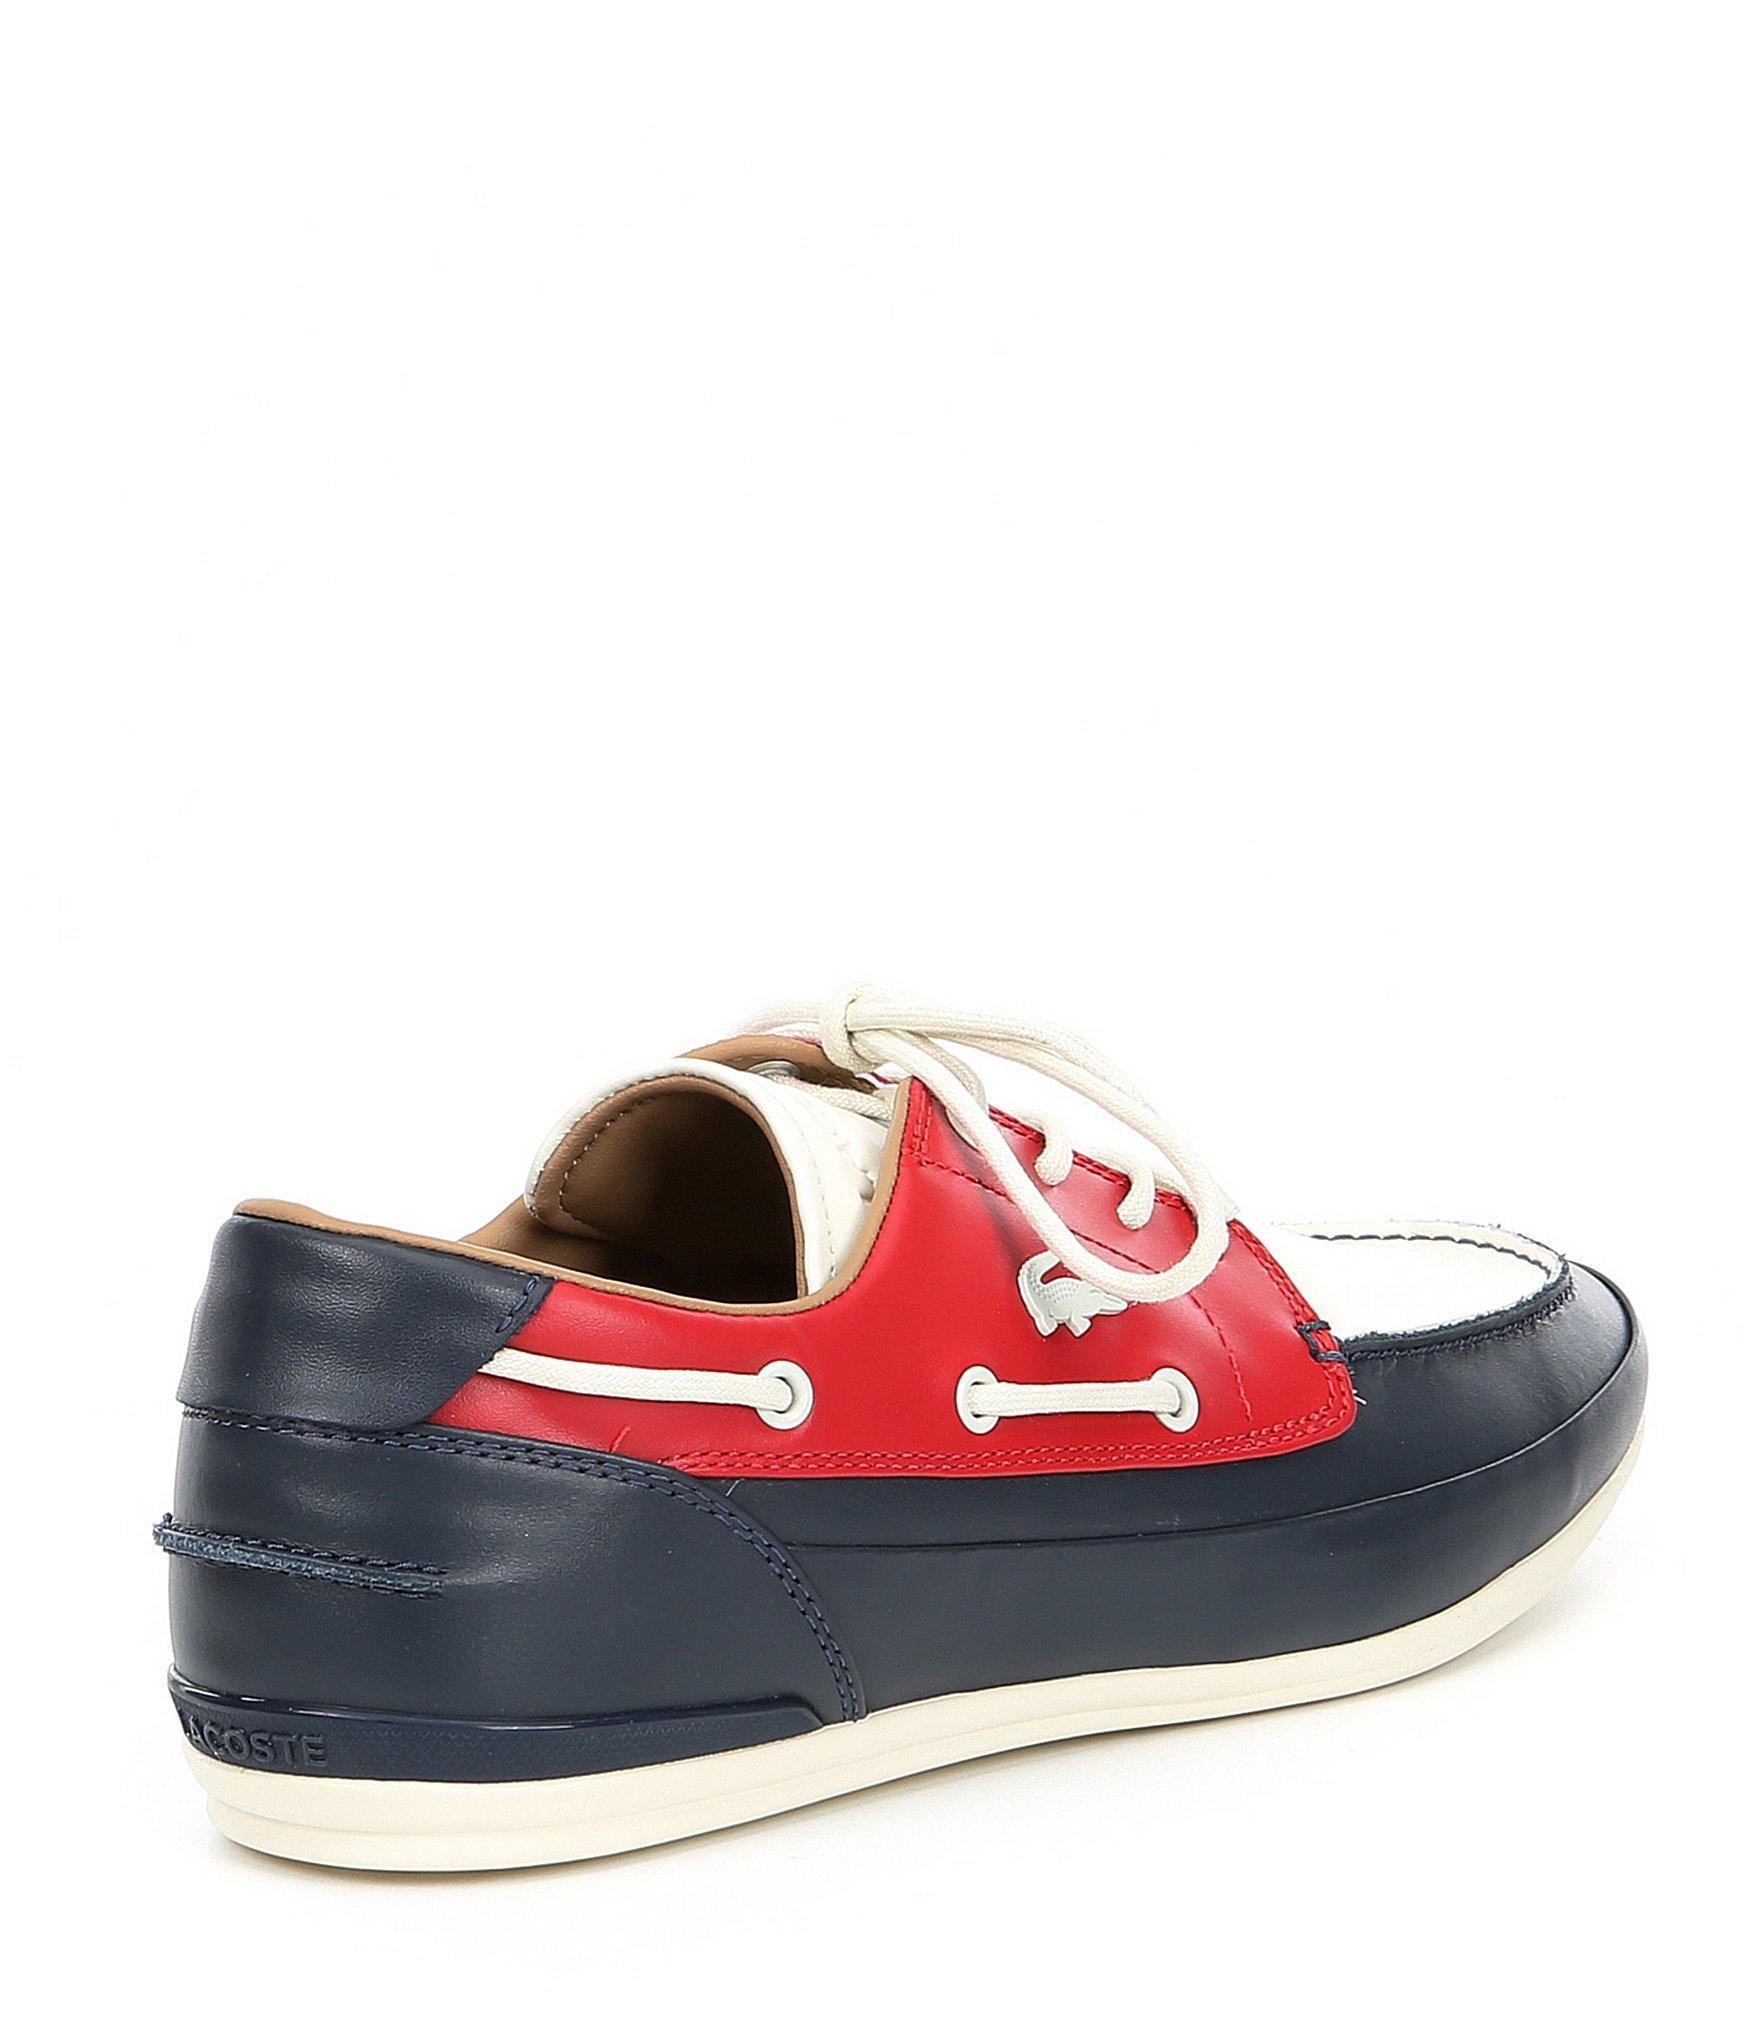 c82c4369c22697 Lacoste - Red Men s Marina Leather Boat Shoe for Men - Lyst. View fullscreen